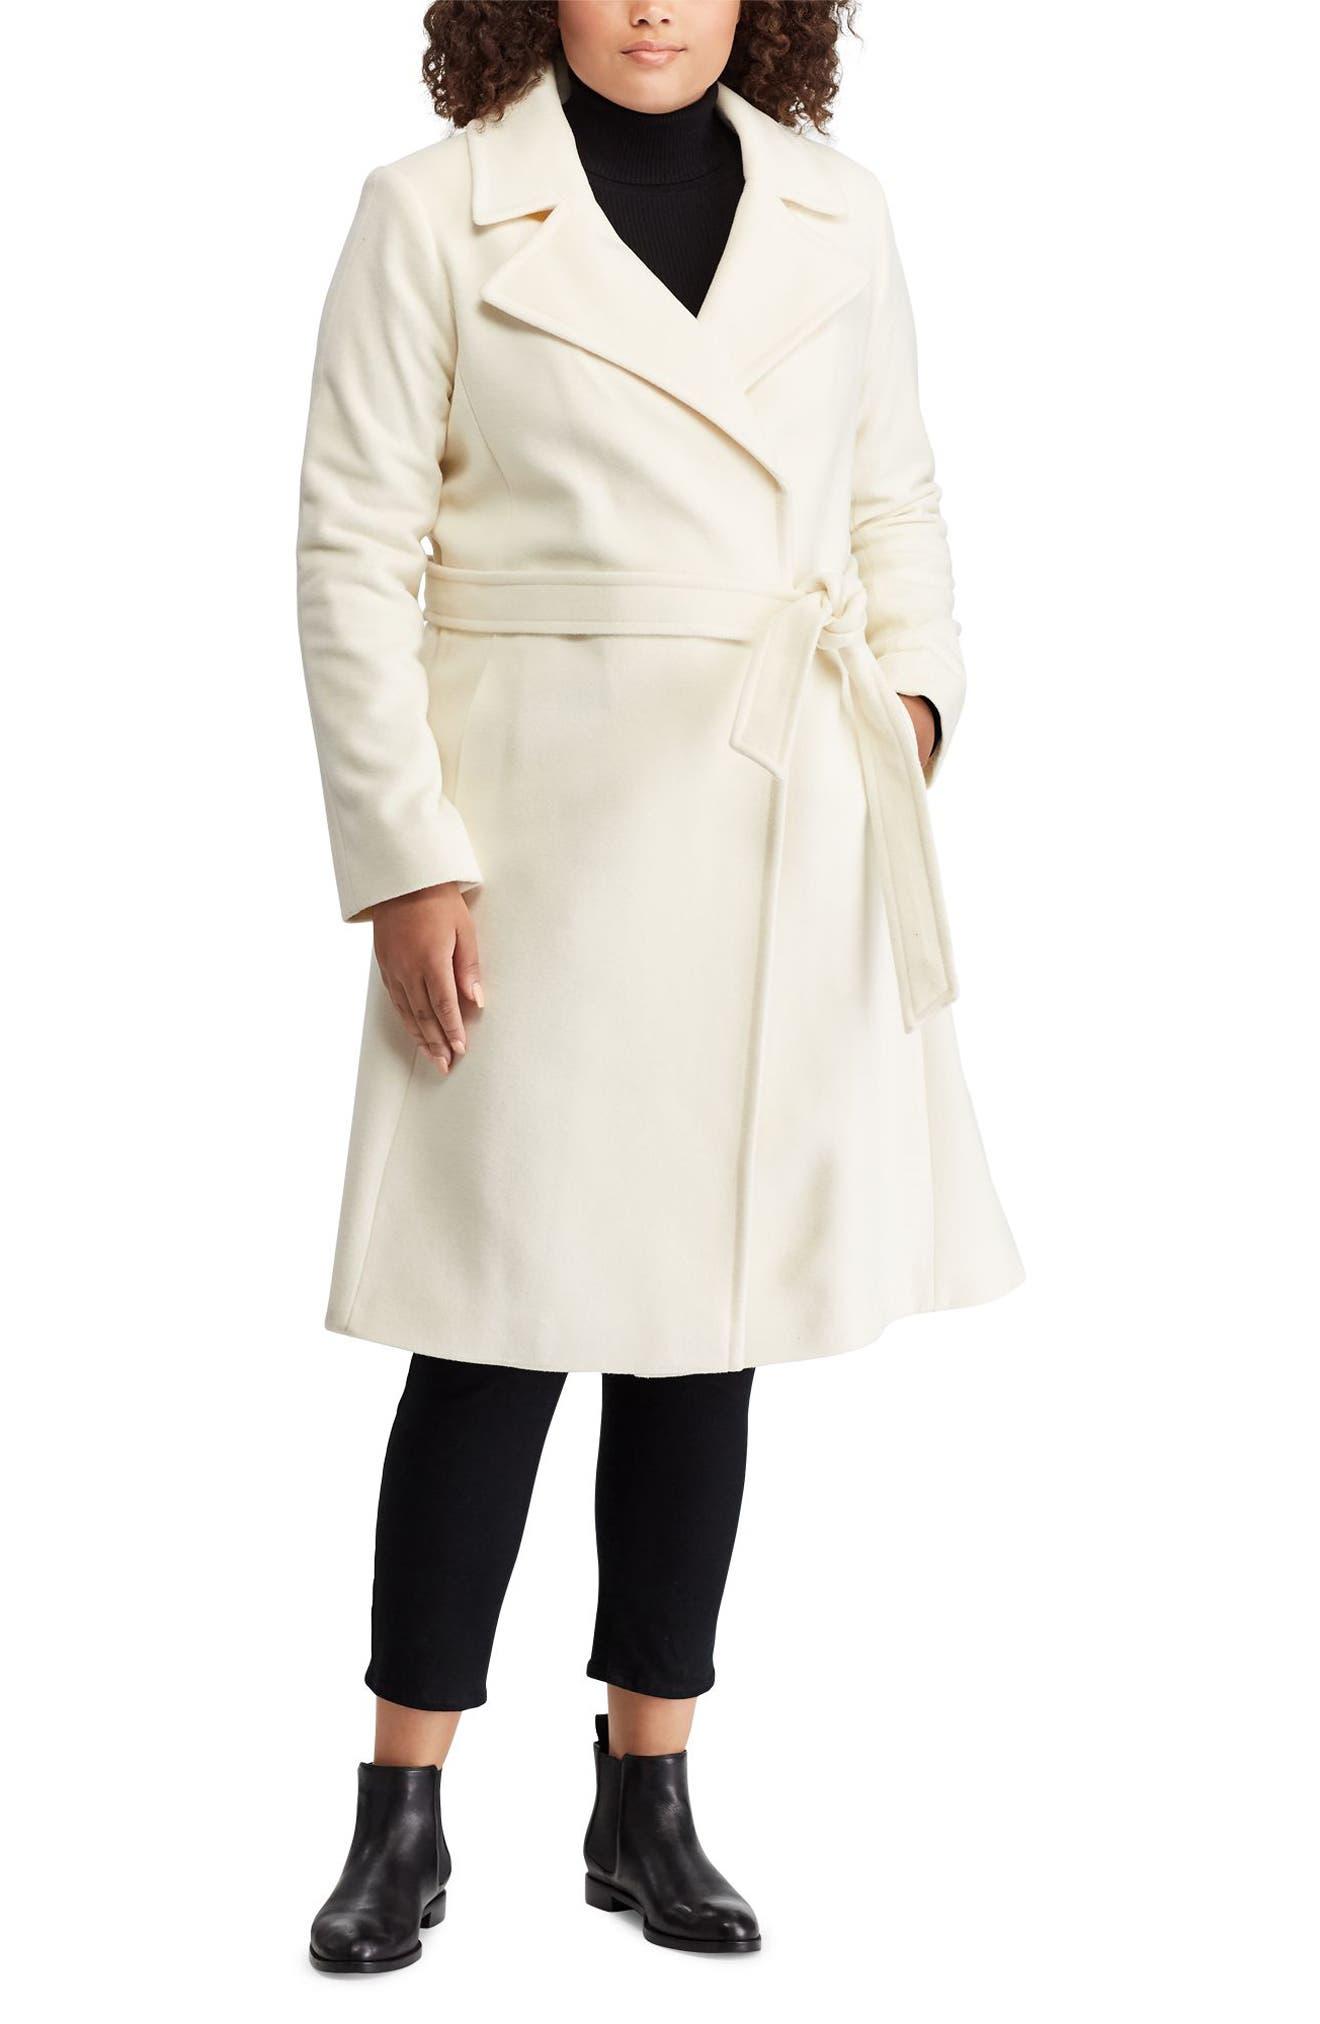 LAUREN RALPH LAUREN,                             Wool Blend Wrap Coat,                             Alternate thumbnail 3, color,                             MODA CREAM